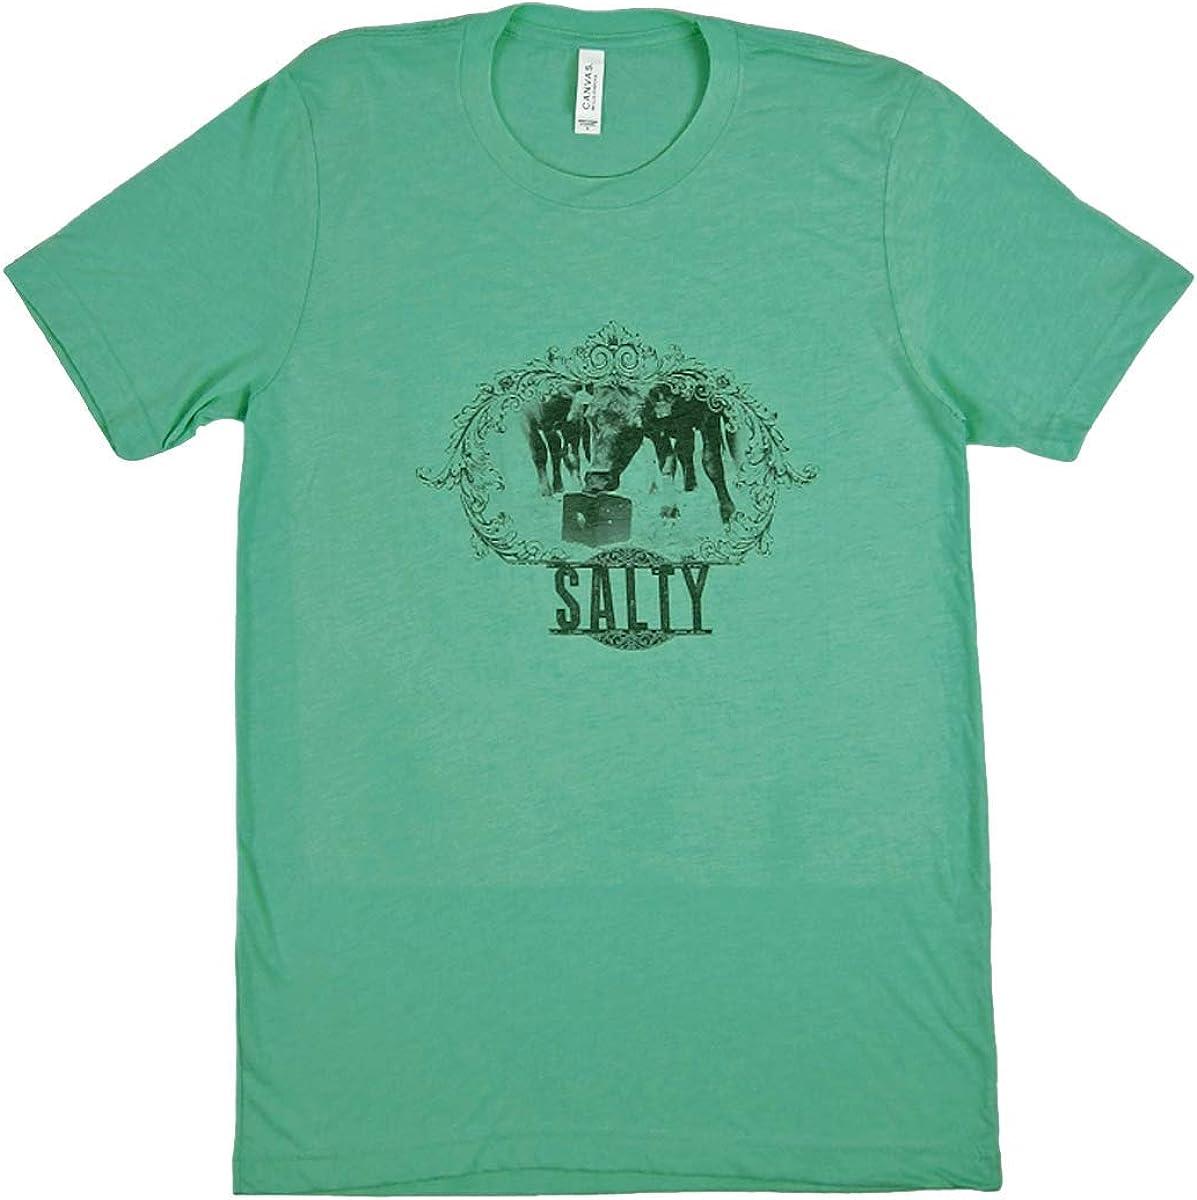 STS Ranchwear Youth Tahiti Blue Salty Tee, Large